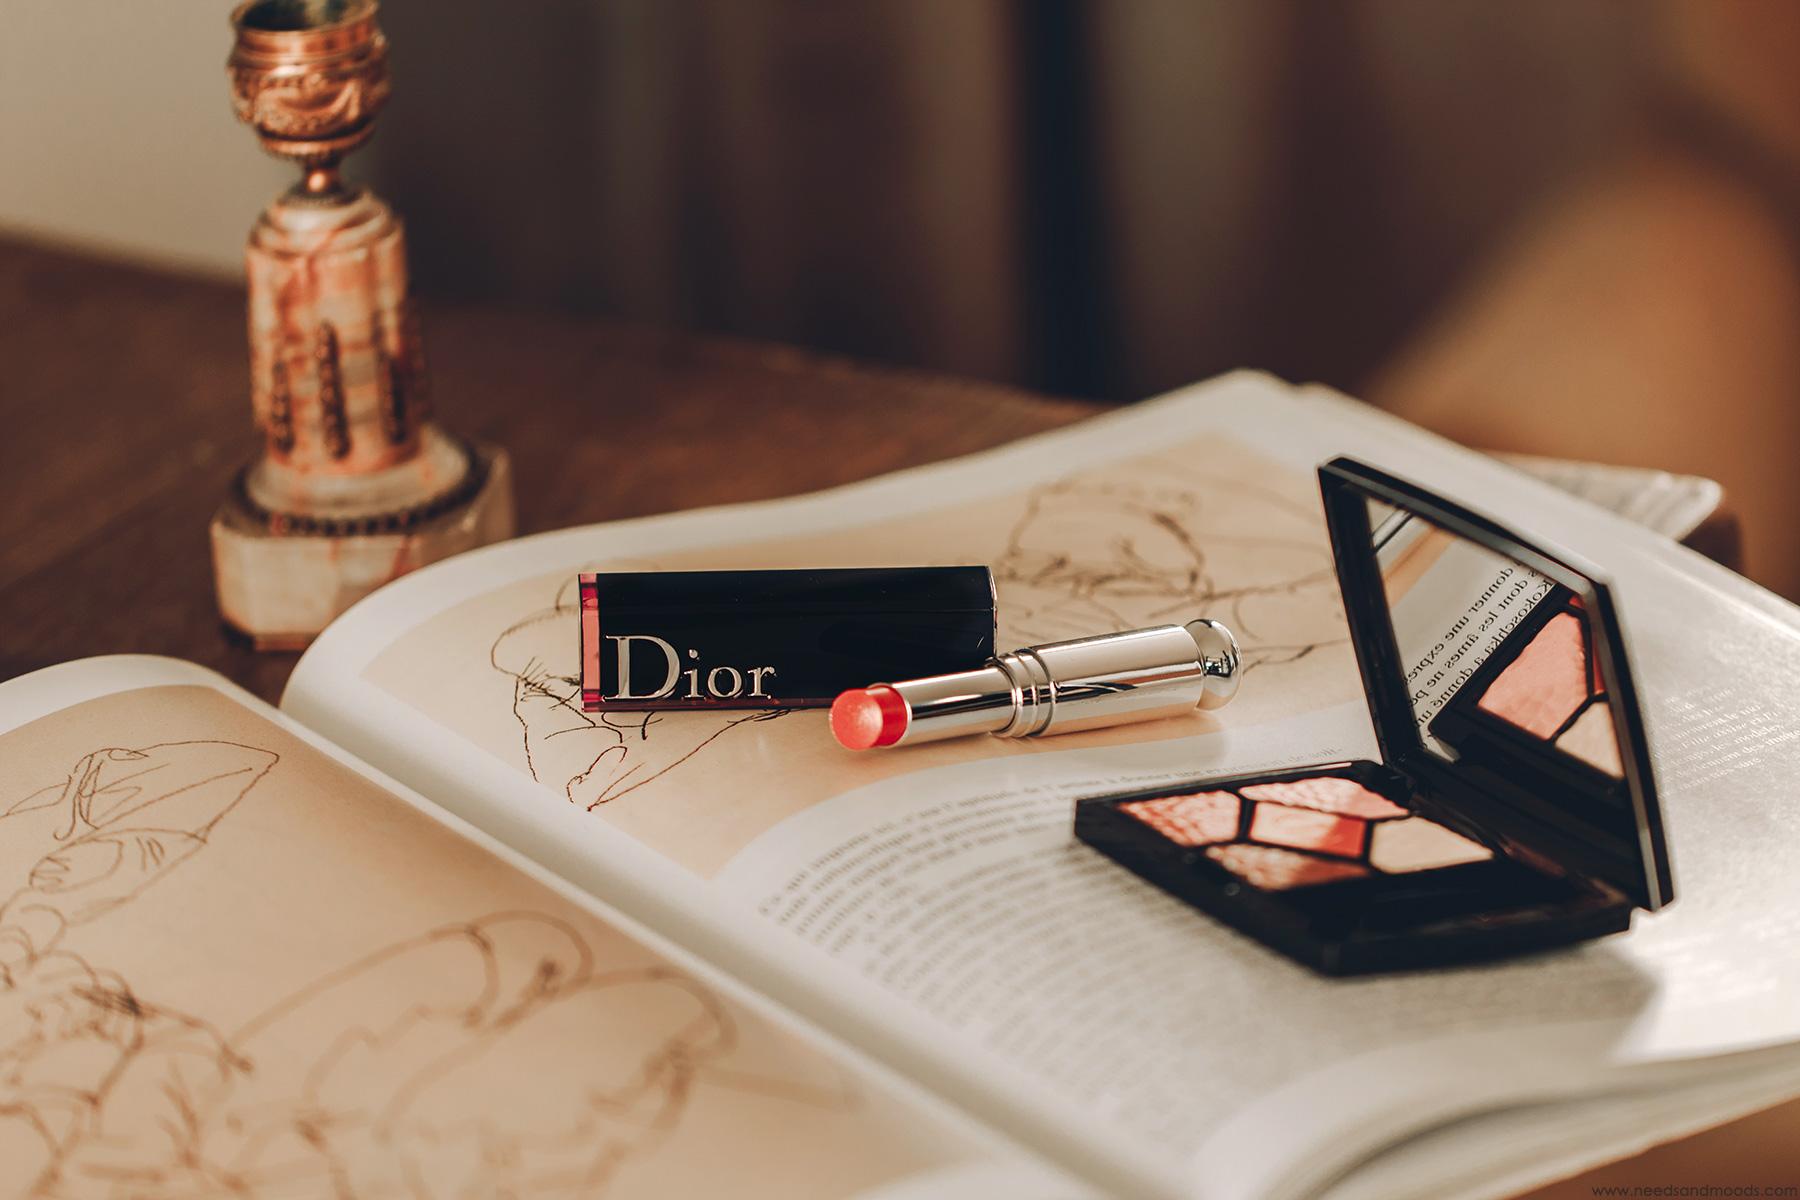 dior addict lacquer stick summer 2019